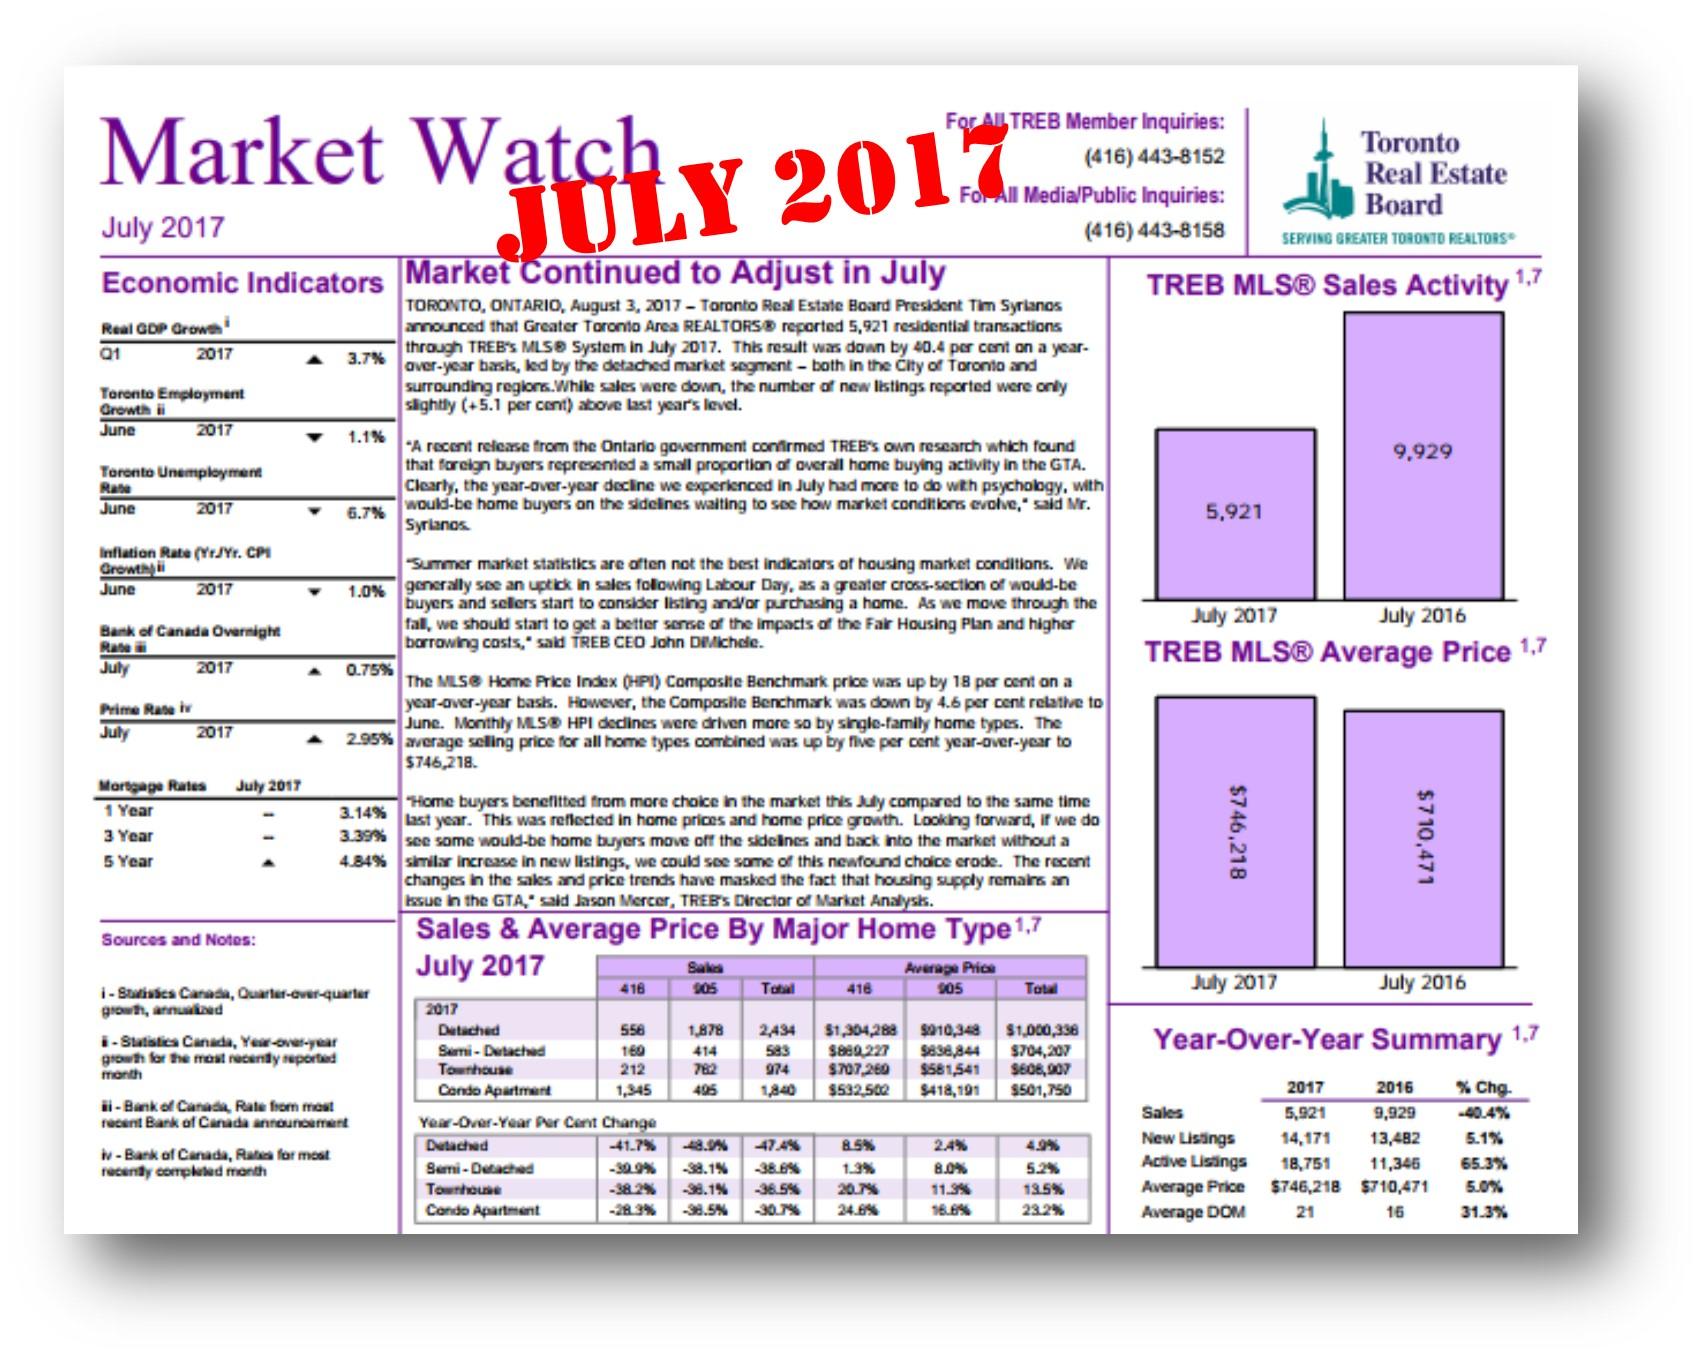 TREB MW FRONT PAGE Jul. 2017.jpg